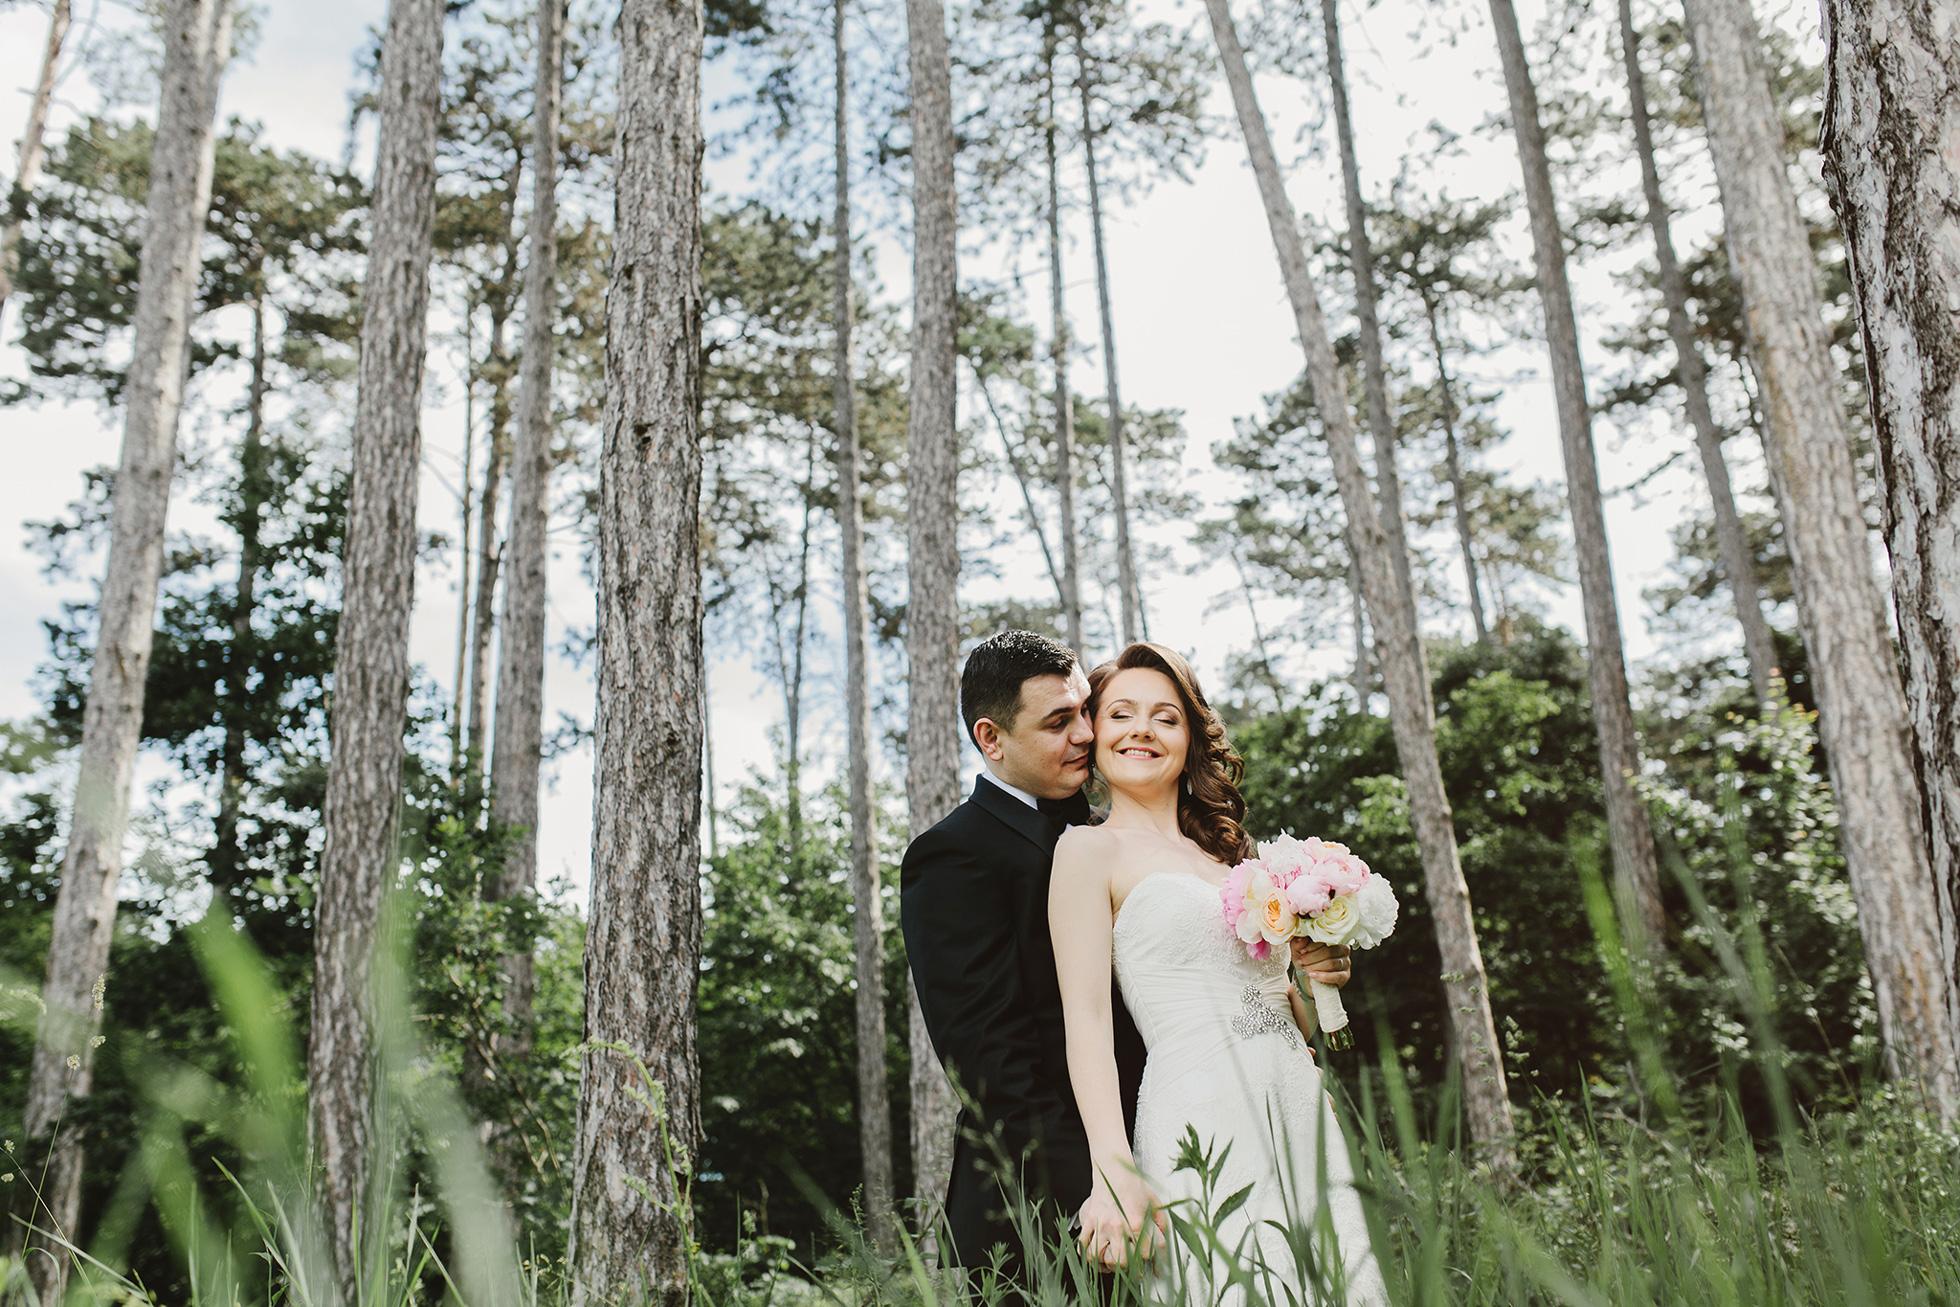 Liana-+-Florin-{wedding}-041